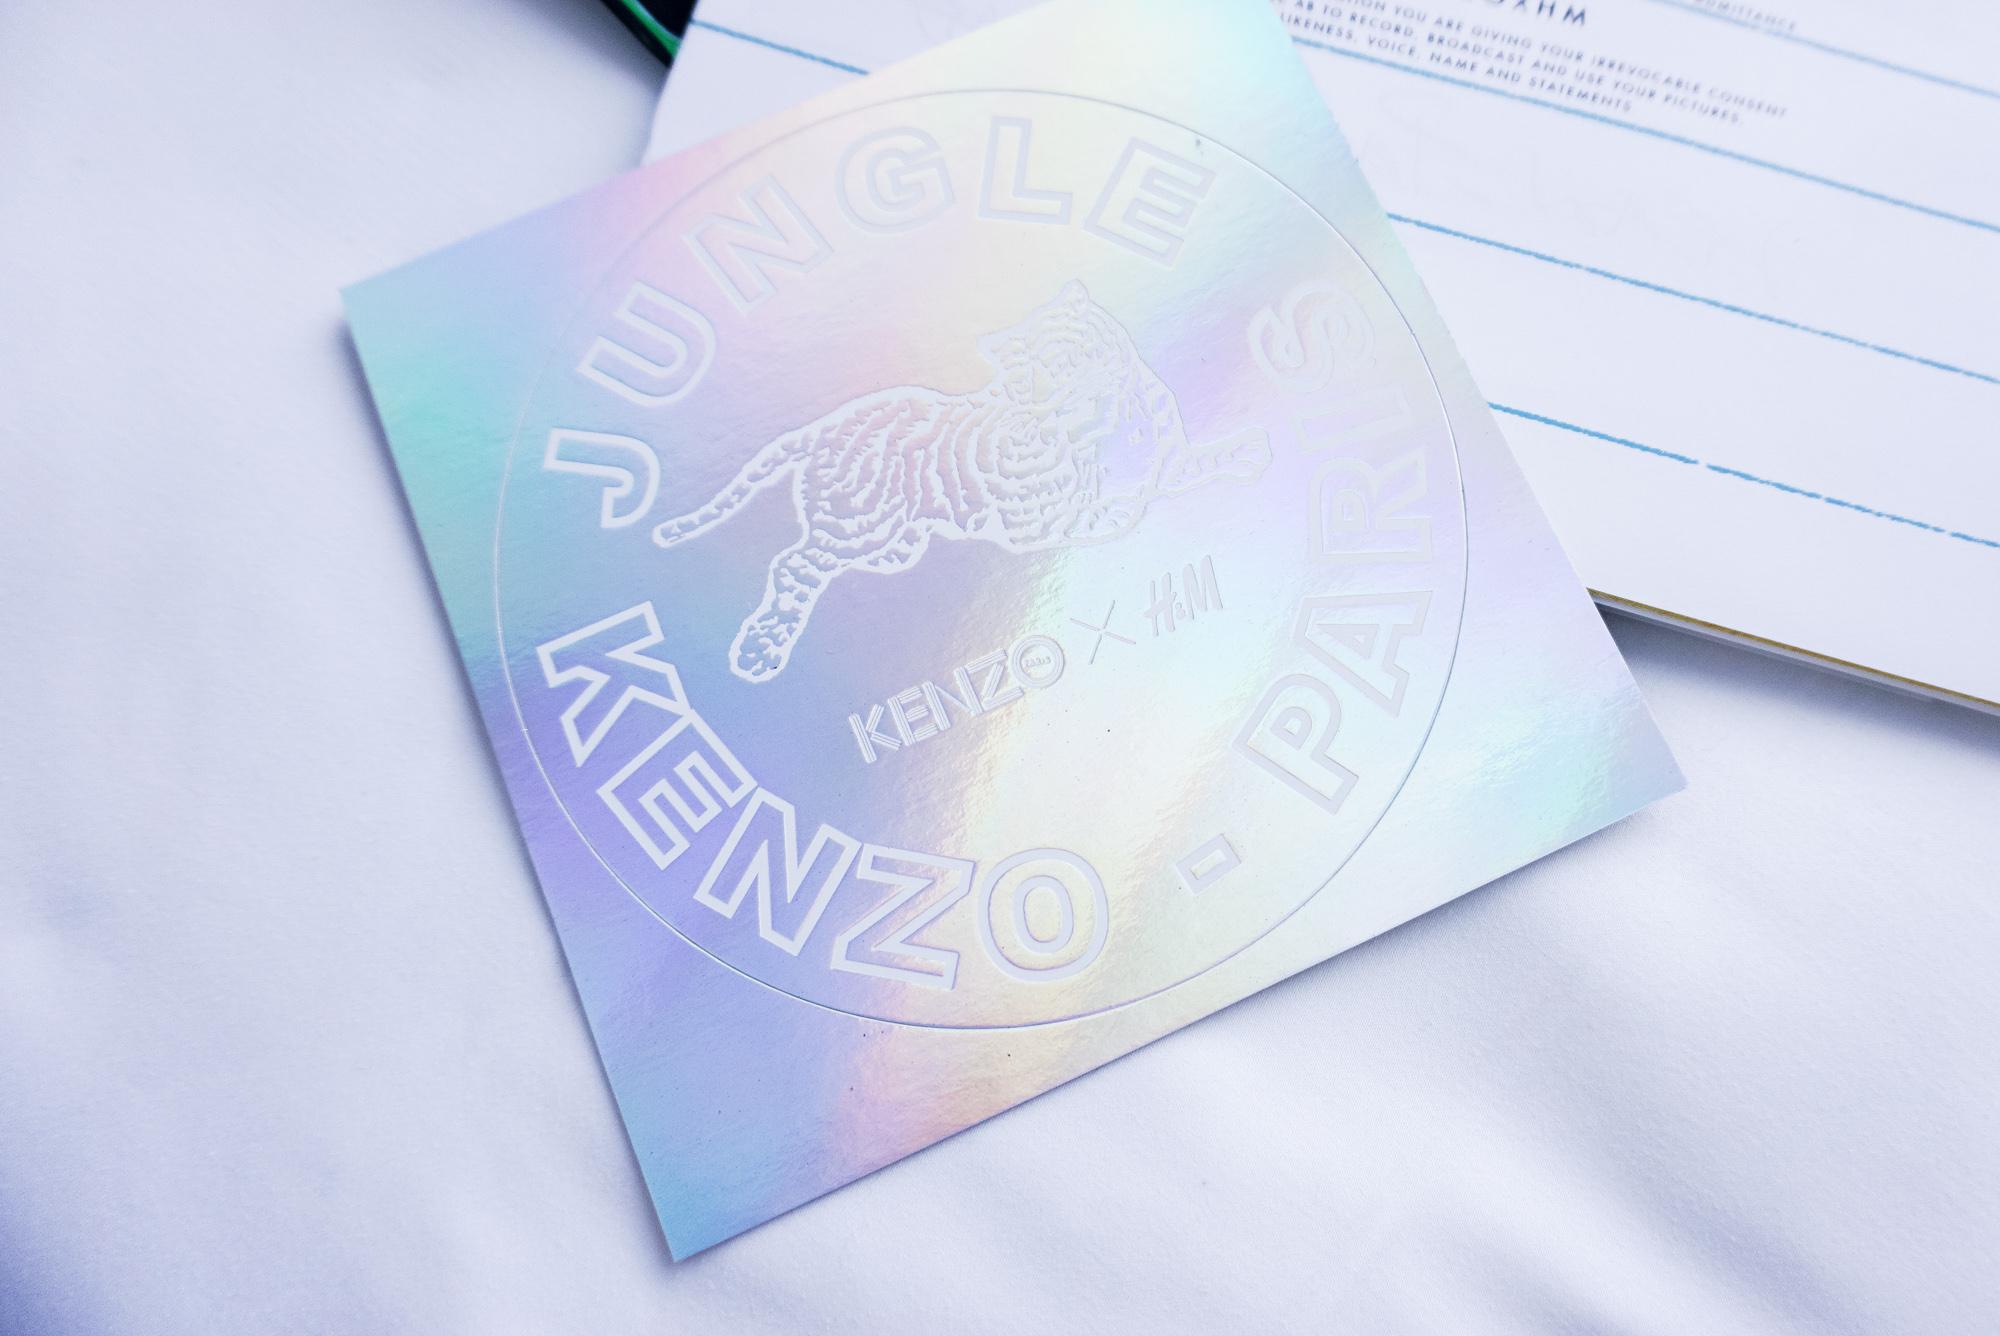 kenzo-newkewl-hm-newyork-day1-10